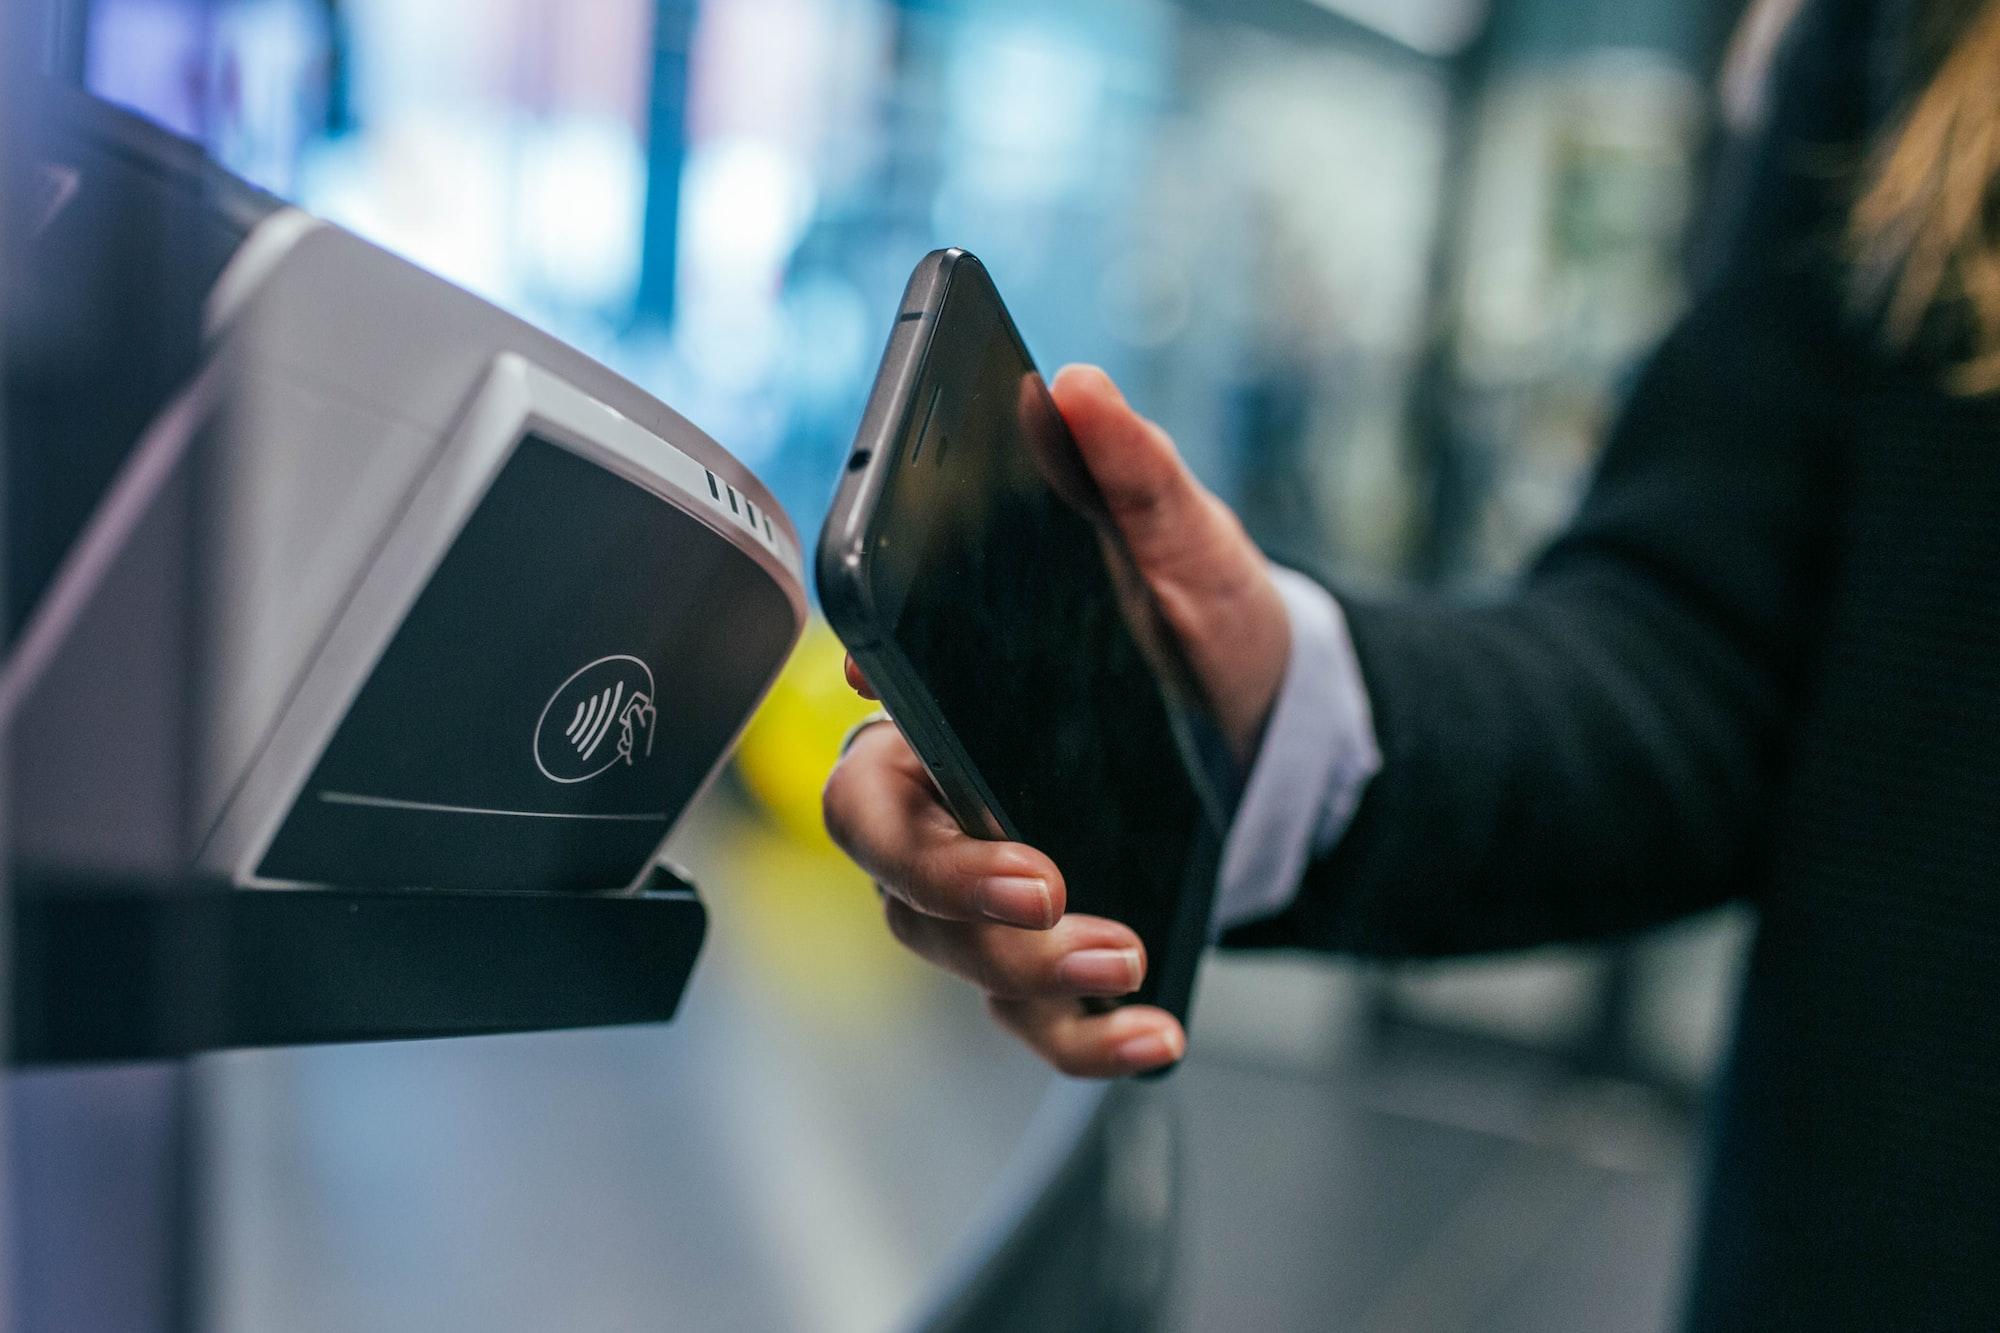 Mobile Payment using Payment Terminal. Picture taken bij Jonas Leupe (www.brandstof.studio) for In The Pocket (www.inthepocket.com)